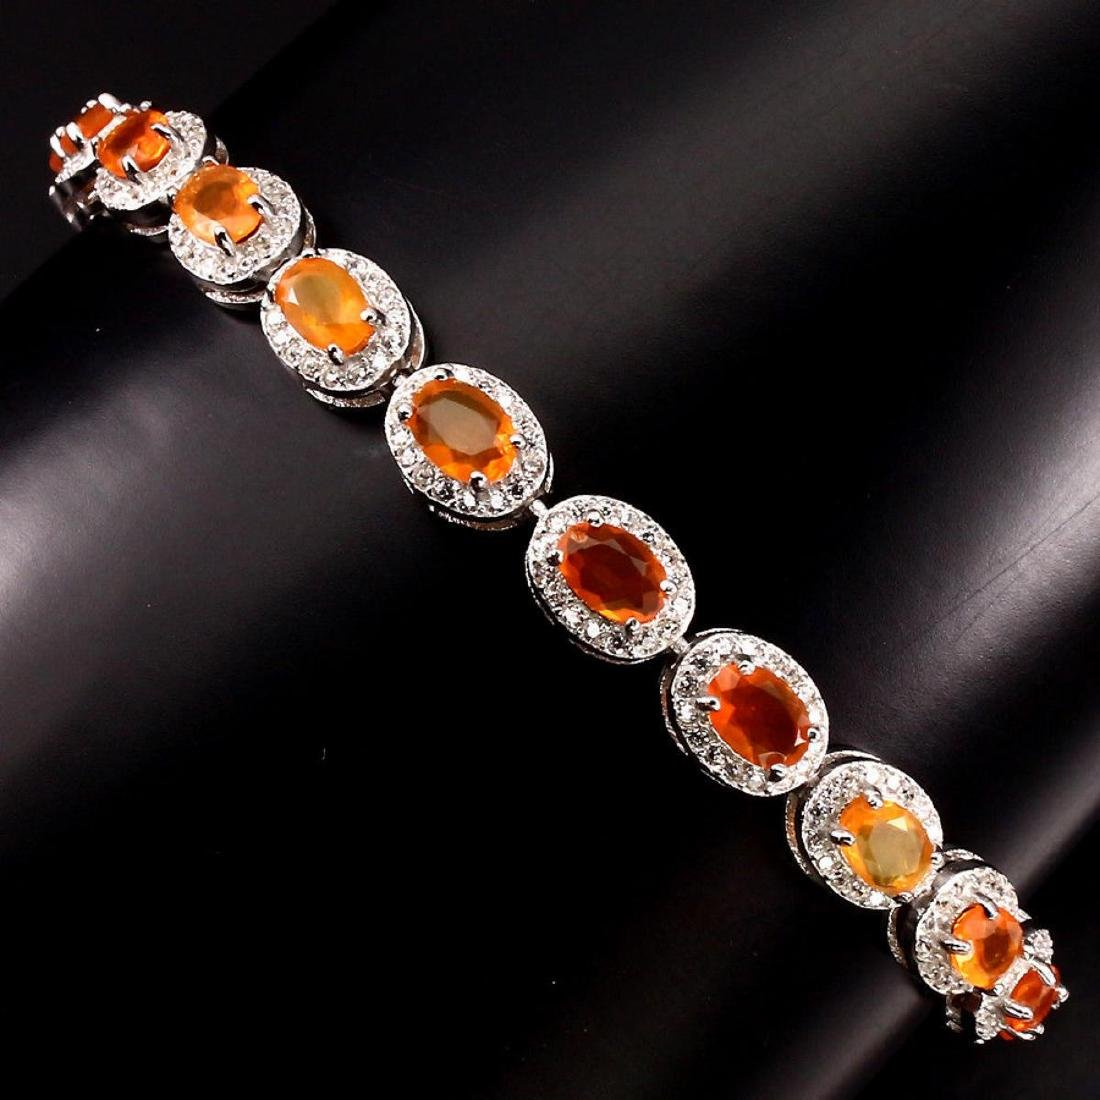 Natural Top Rich Orange Fire Opal Bracelet - 2